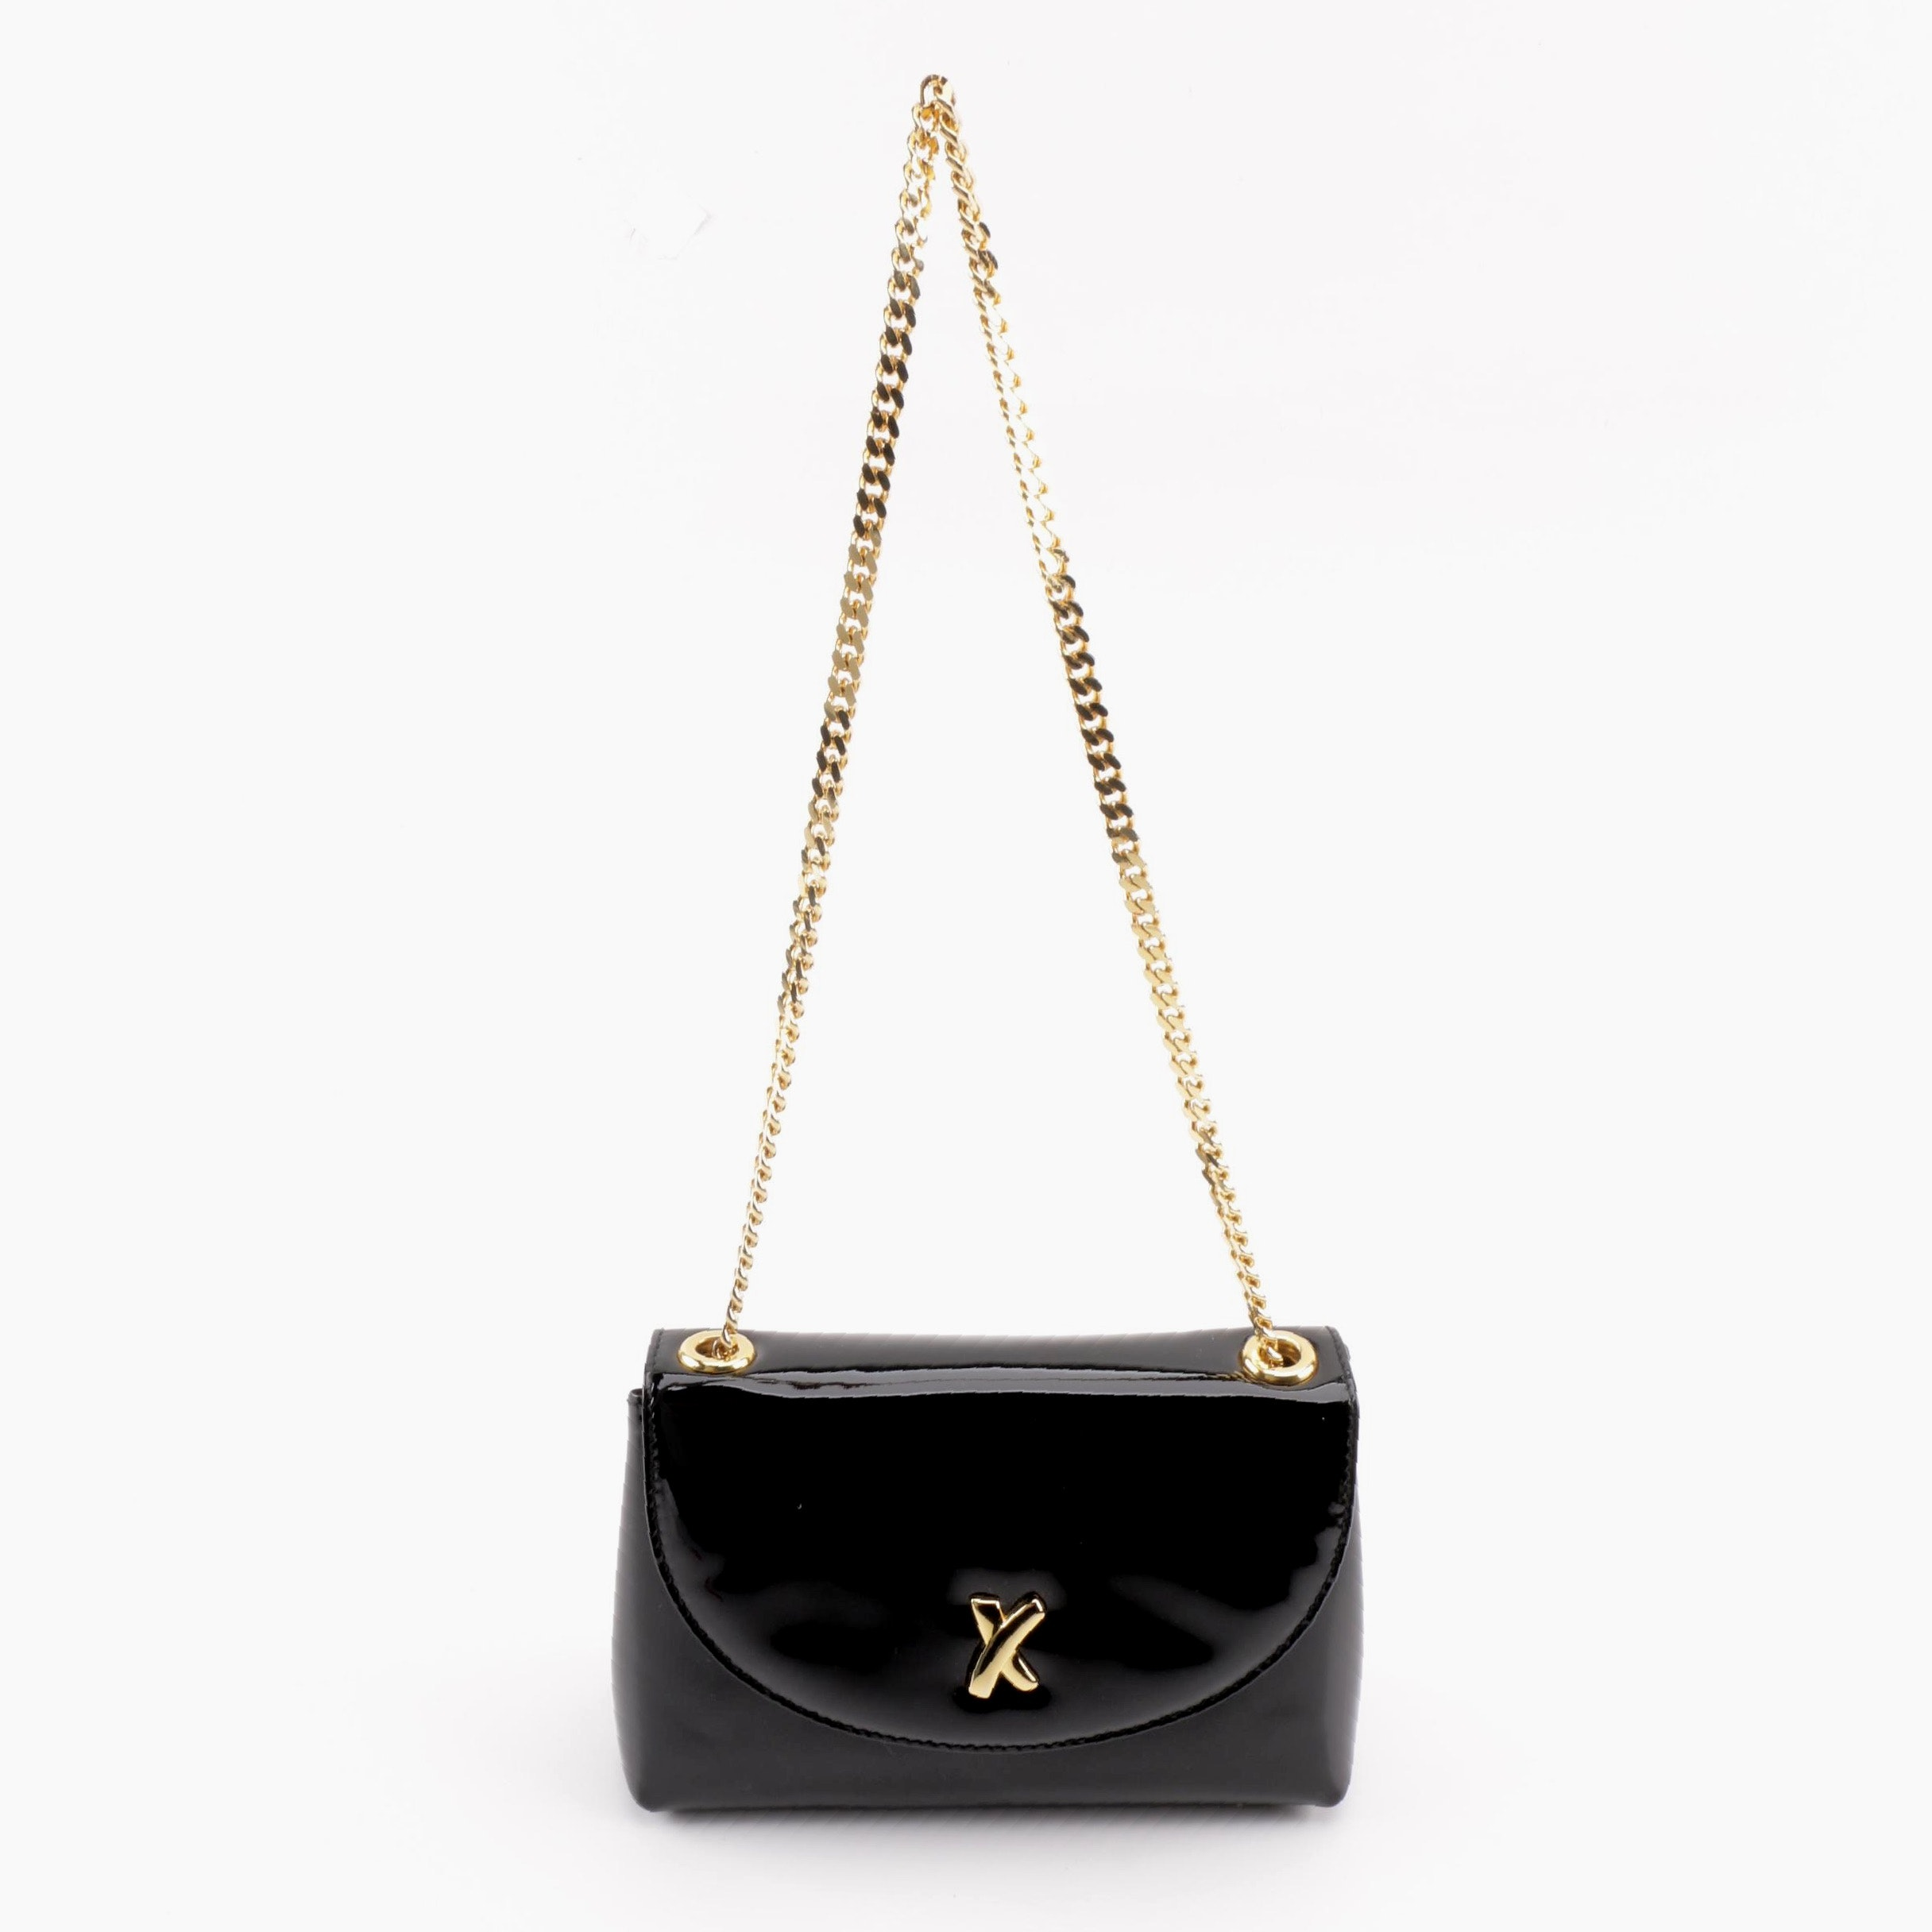 Paloma Picasso Black Patent Leather Shoulder Bag